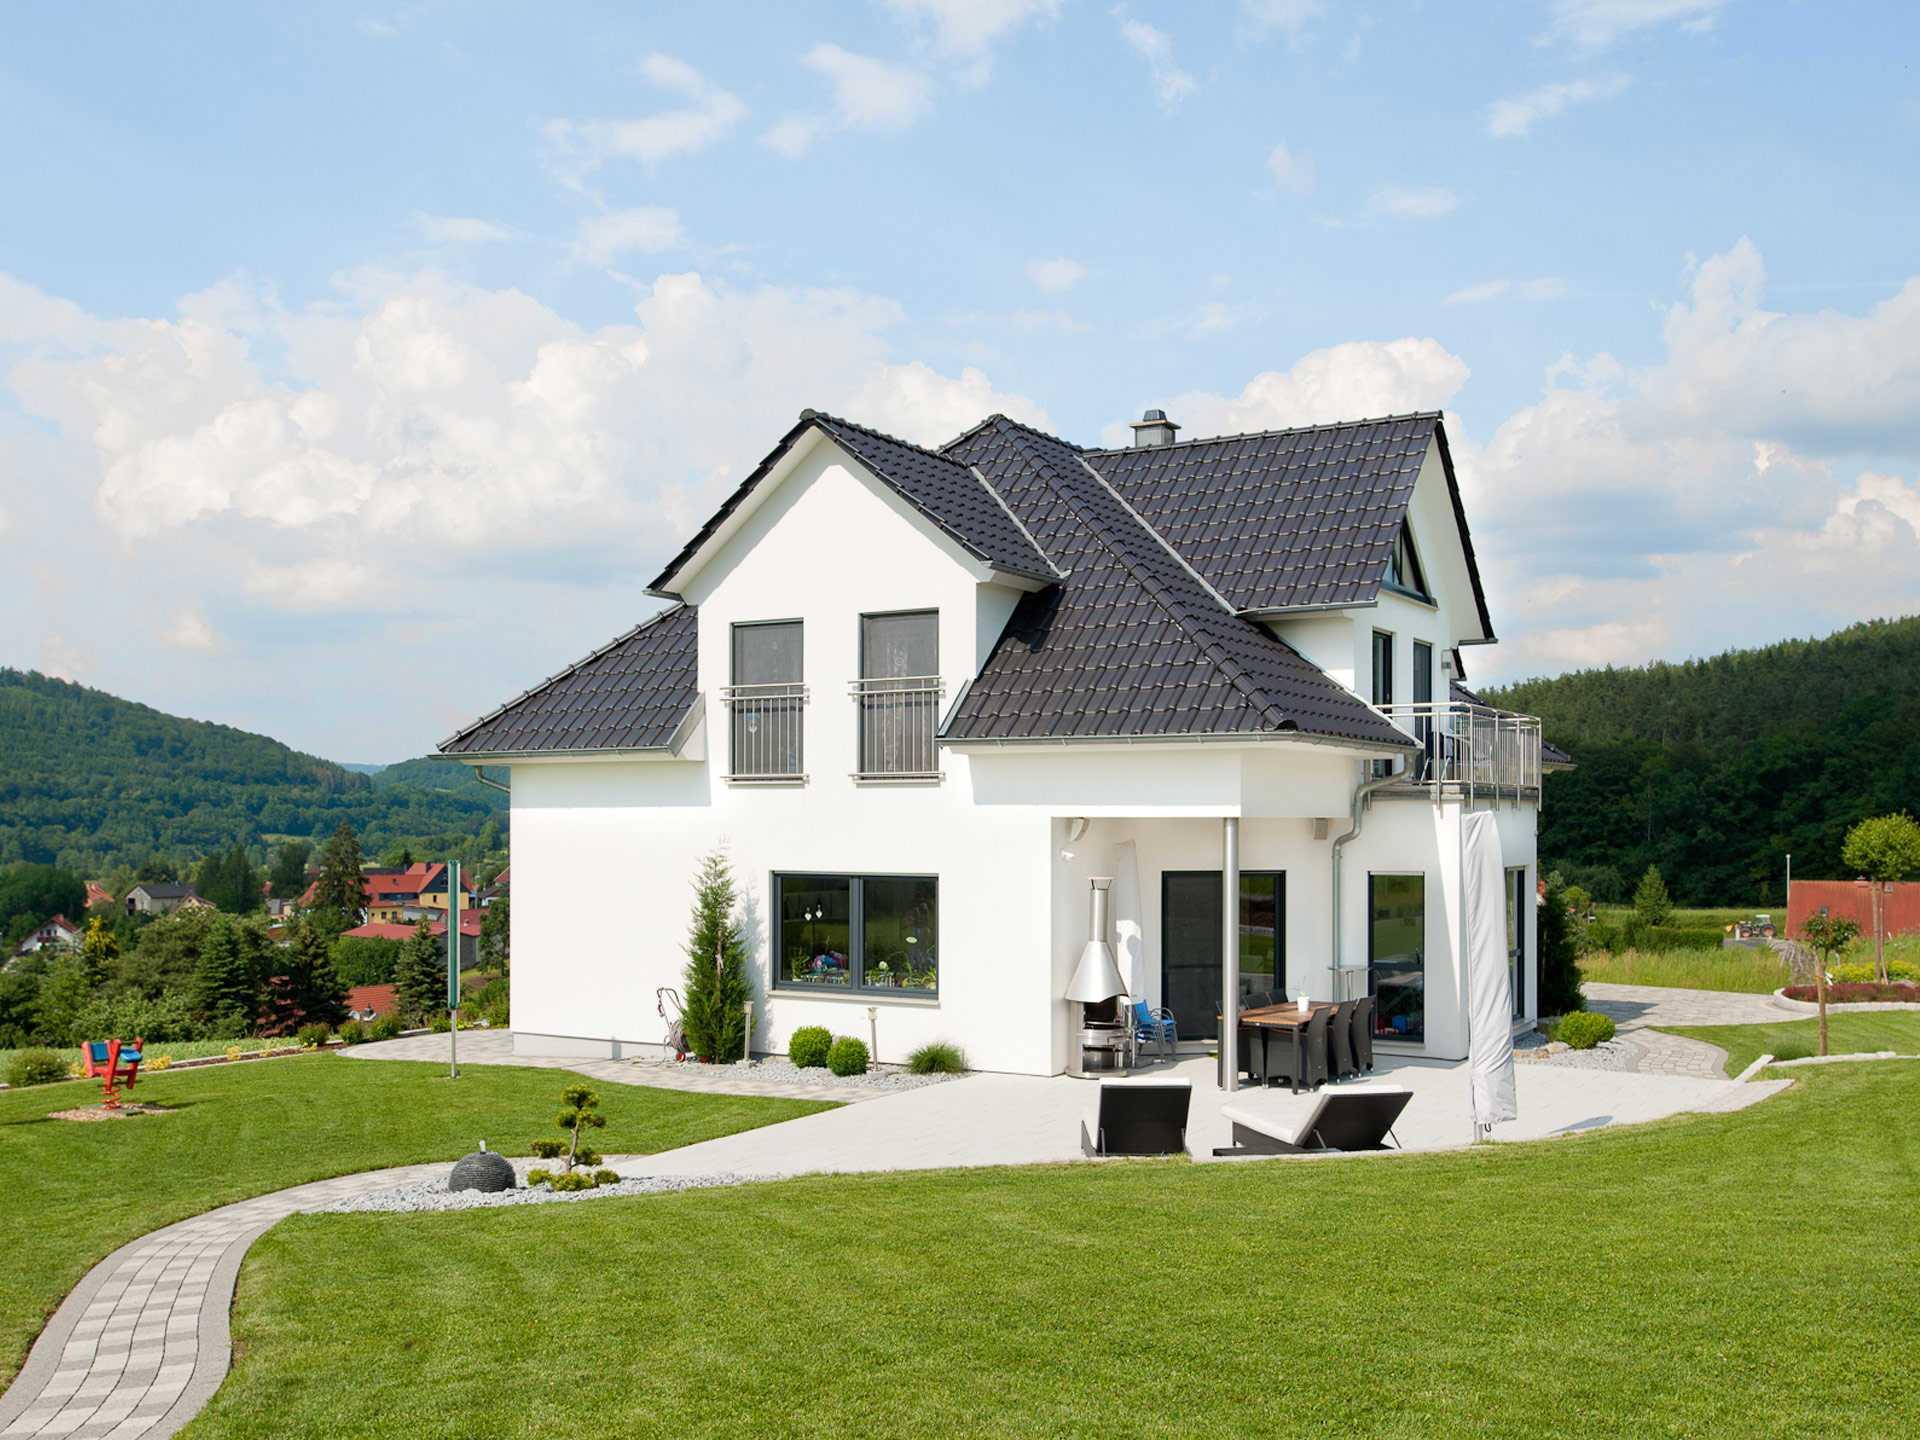 Musterhaus stadtvilla mit garage  Exklusive Villa - ALBERT Haus